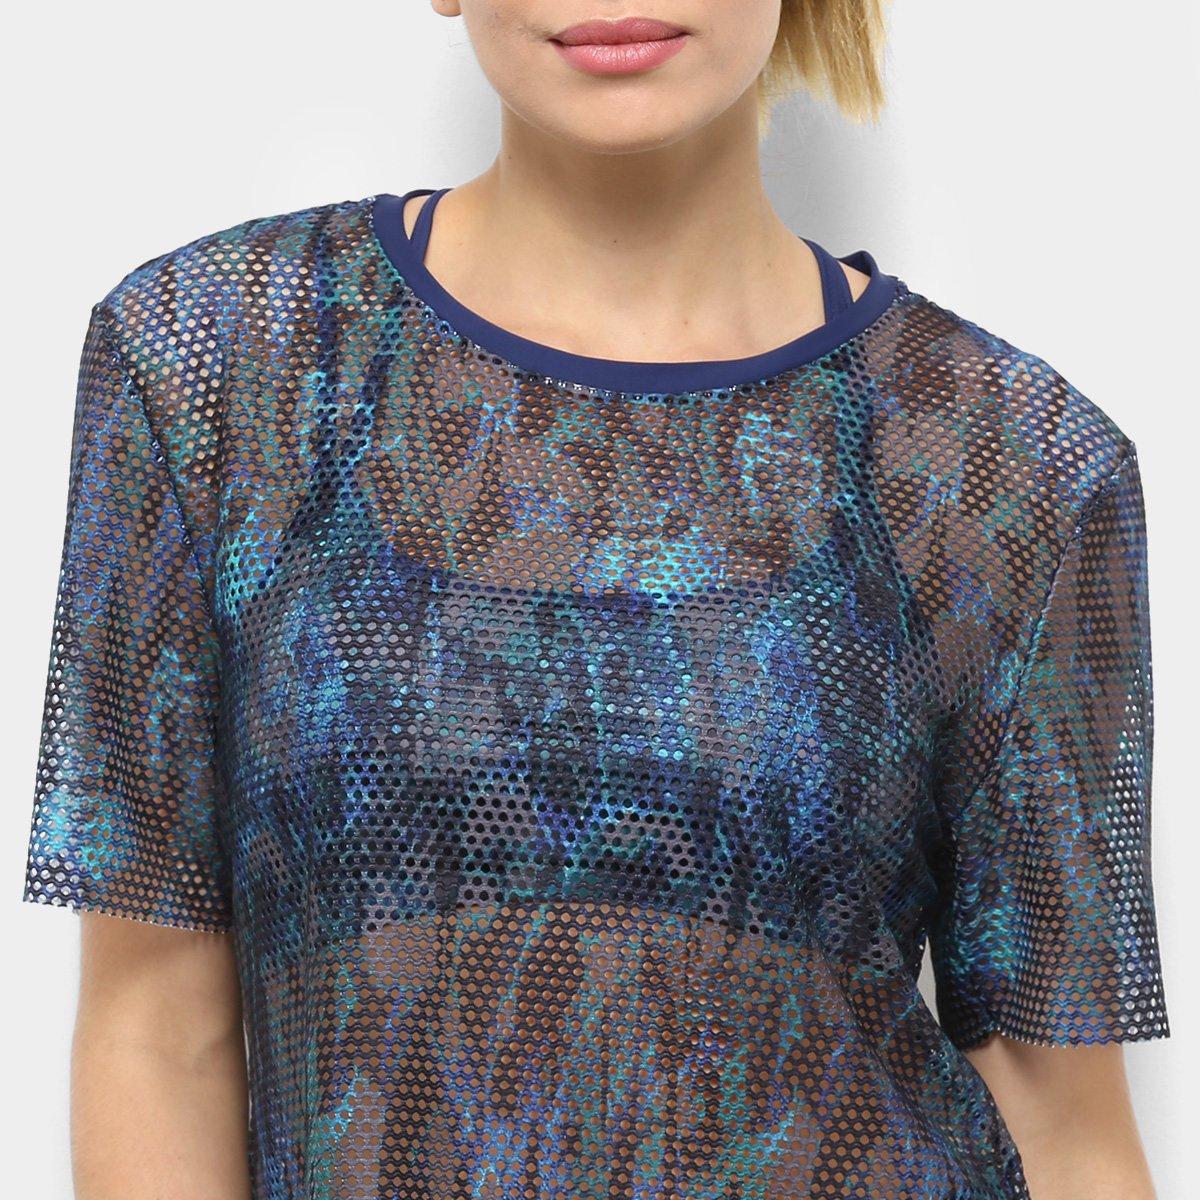 Camiseta Azul Feminina Feminina Noronha Azul Gonew Gonew Camiseta Azul Noronha Noronha Camiseta Gonew Camiseta Feminina qfHfTwxv